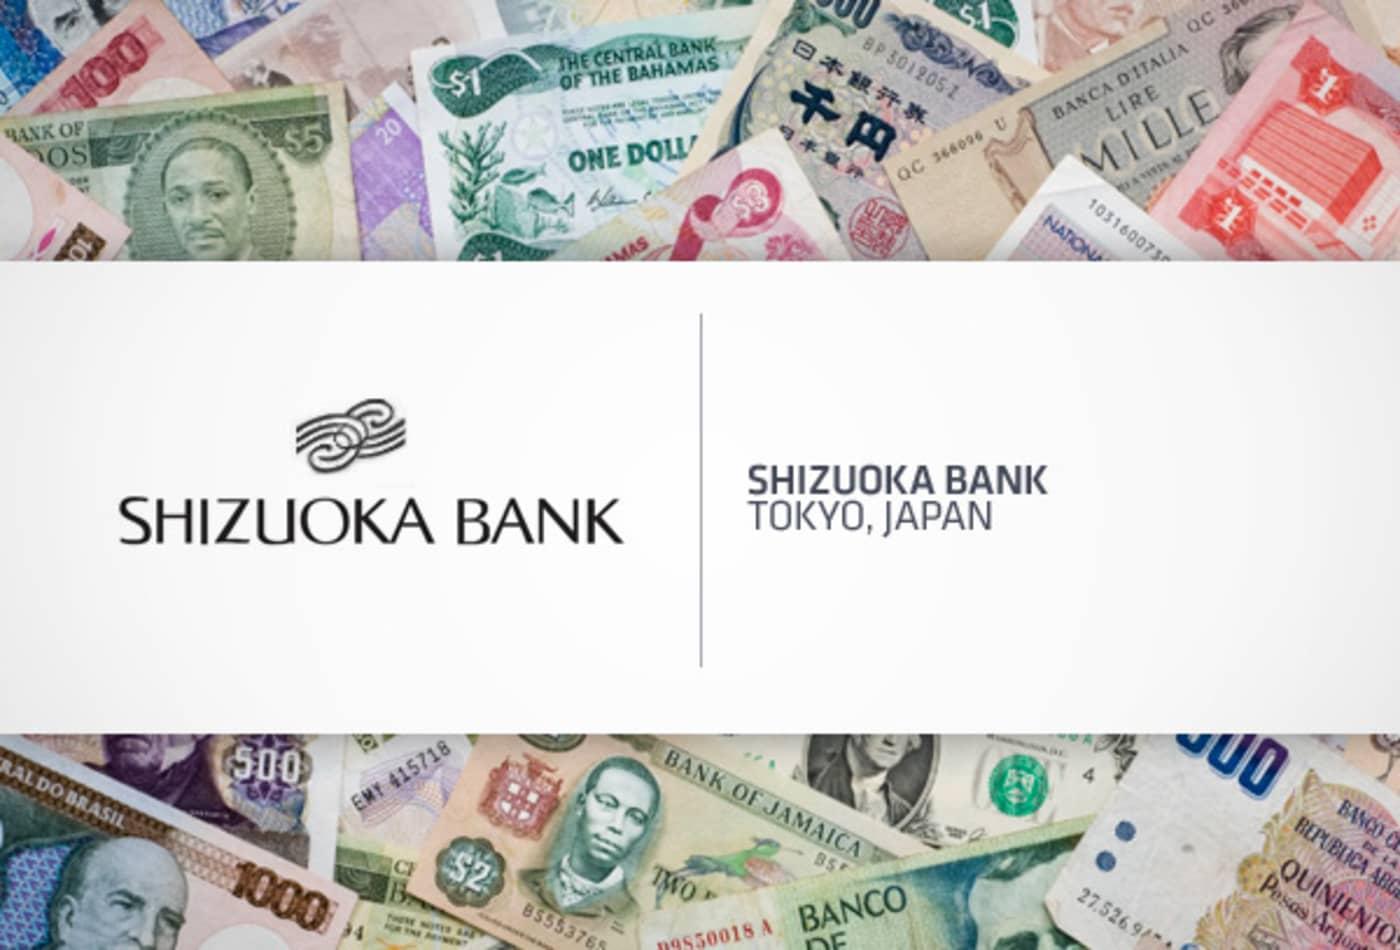 48680599 SS-Safest-Banks-shizuoka-bank-japan-12.jpg